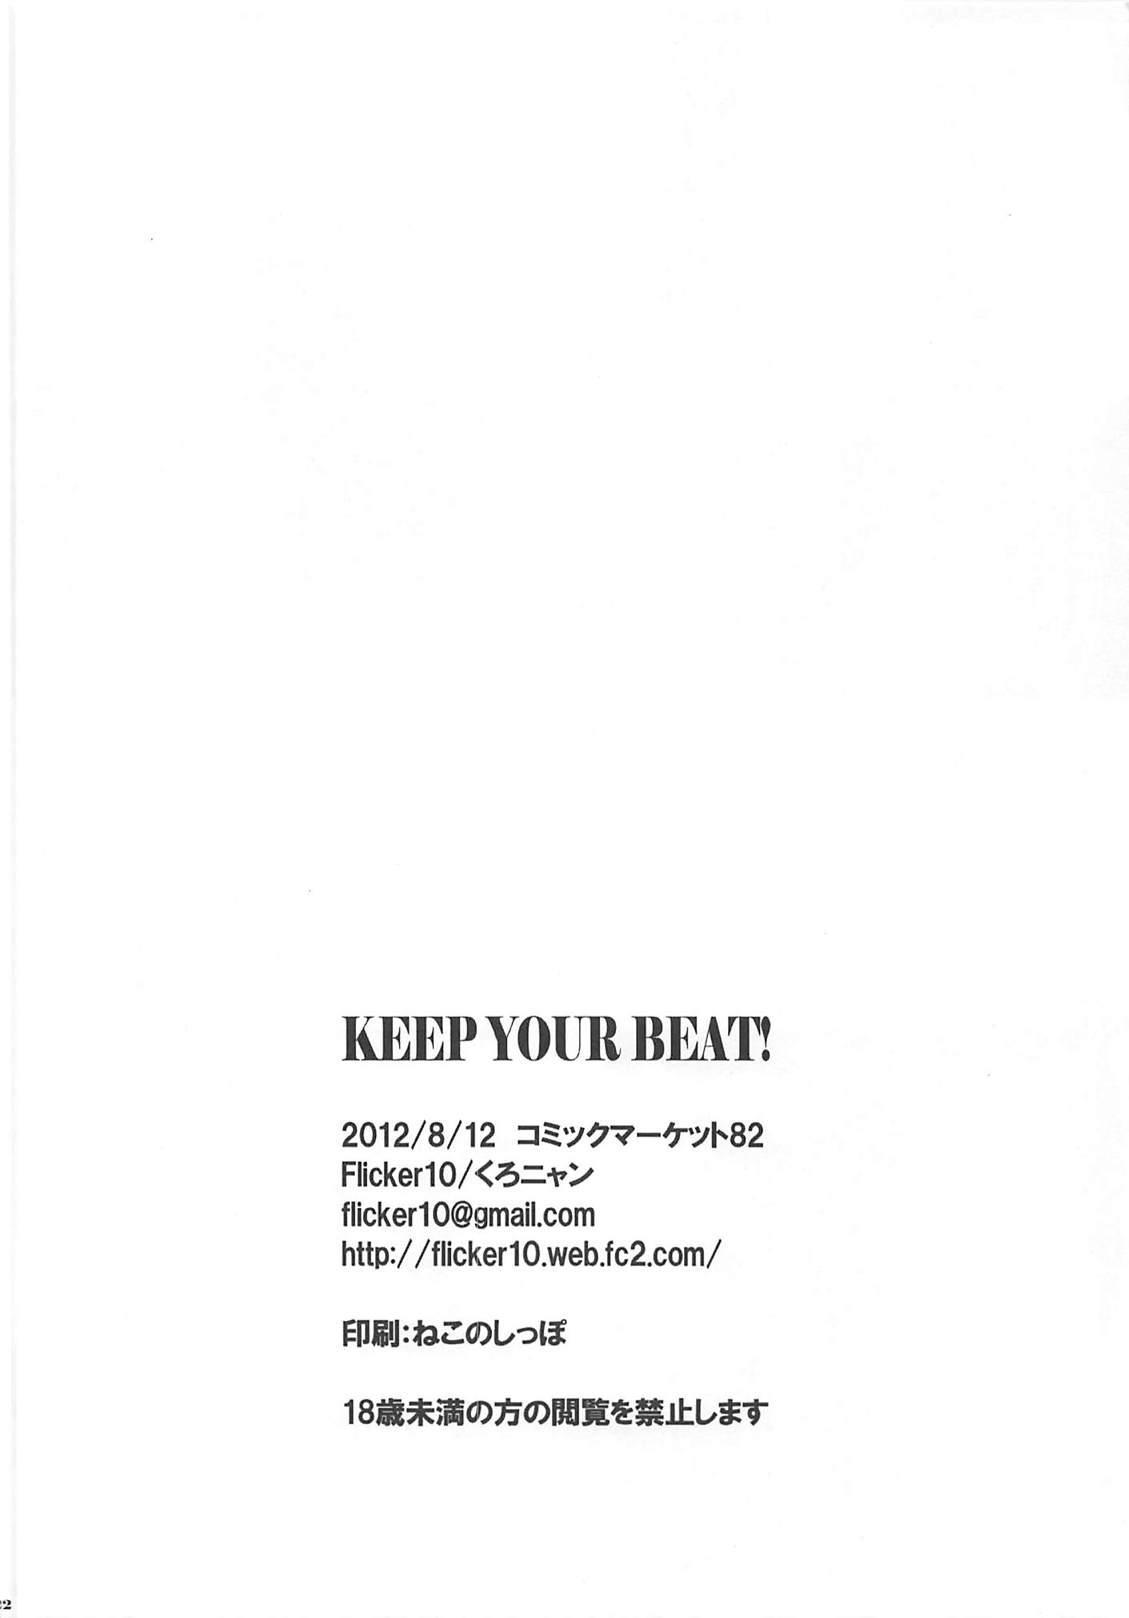 KEEP YOUR BEAT! 20